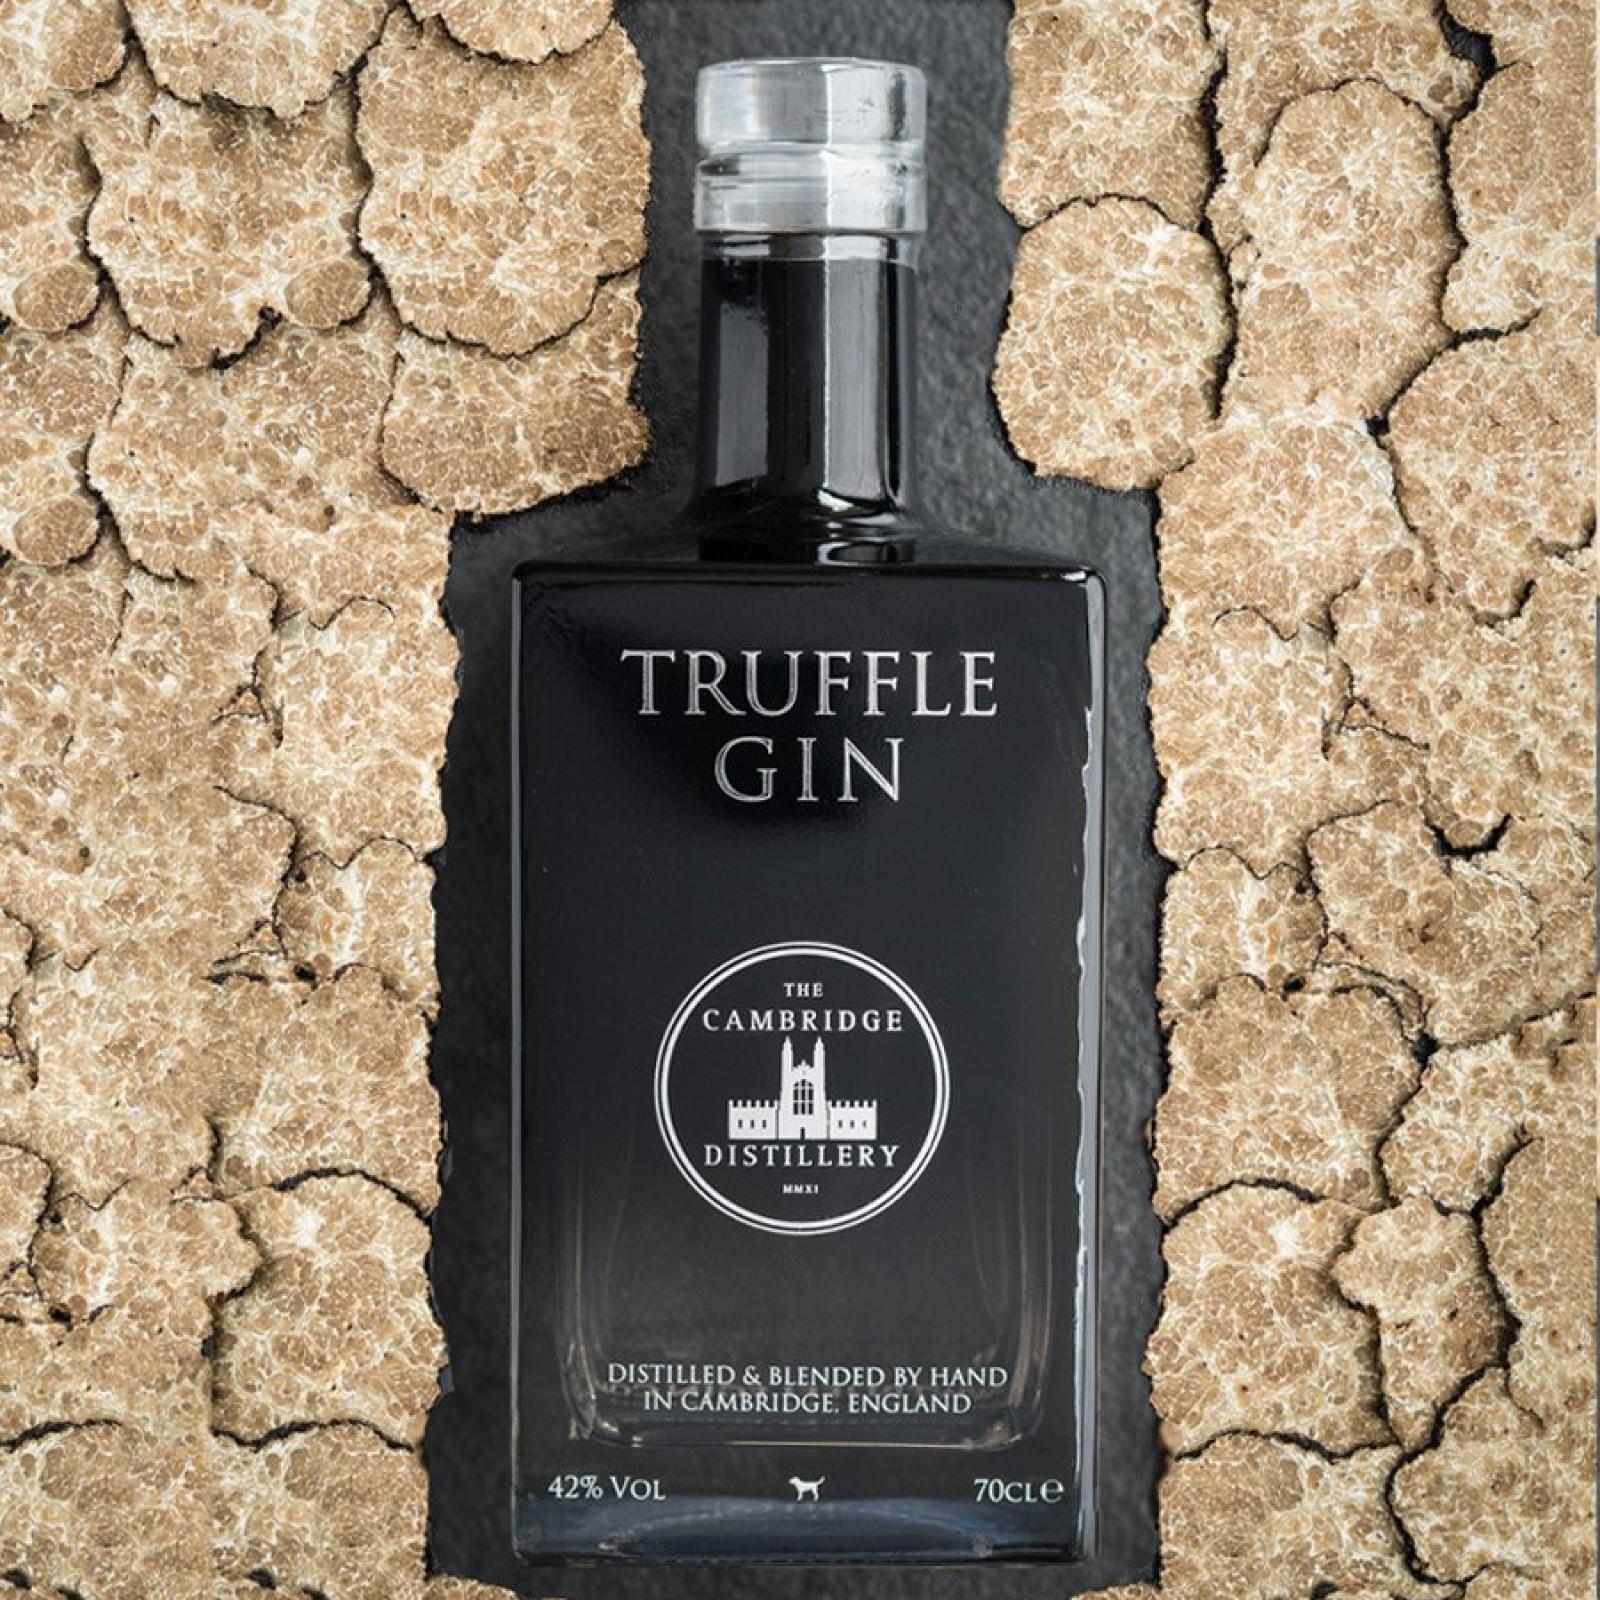 Truffle Gin 42% 700ml Cambridge Distillery